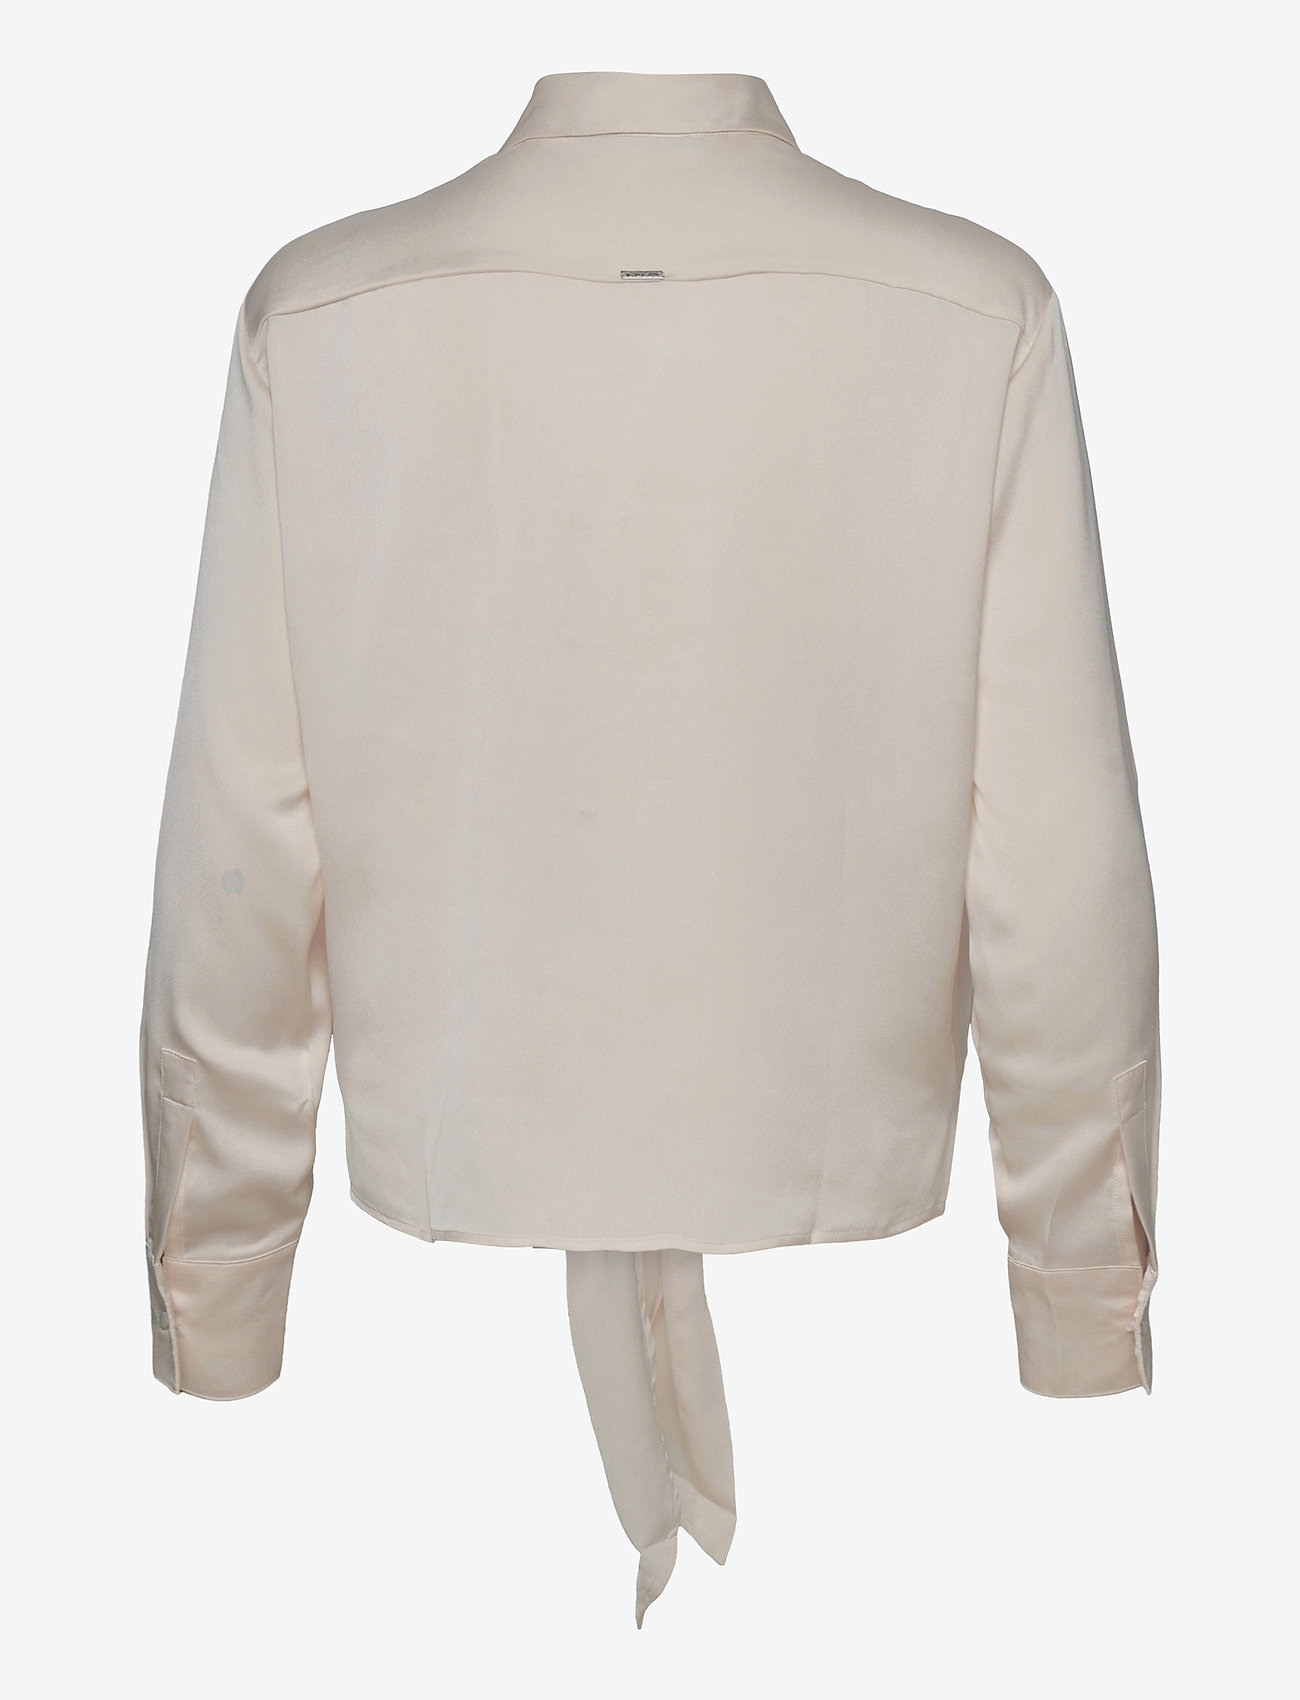 GUESS Jeans - LS AMANDA SHIRT - långärmade skjortor - cream white - 1